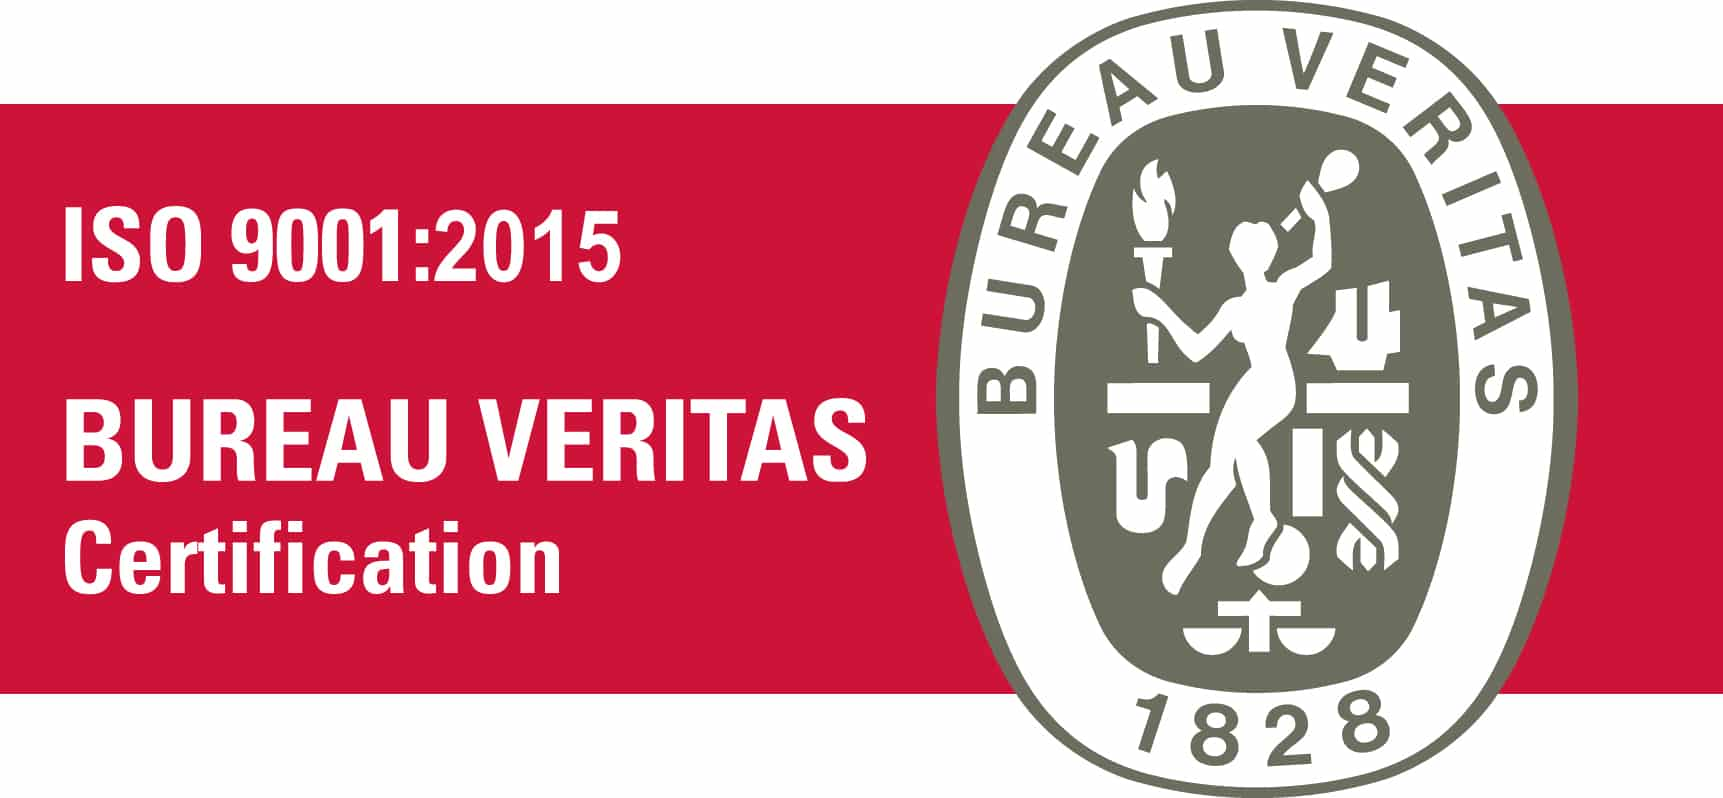 Certification Bureau Véritas ISO 9001 : 2015